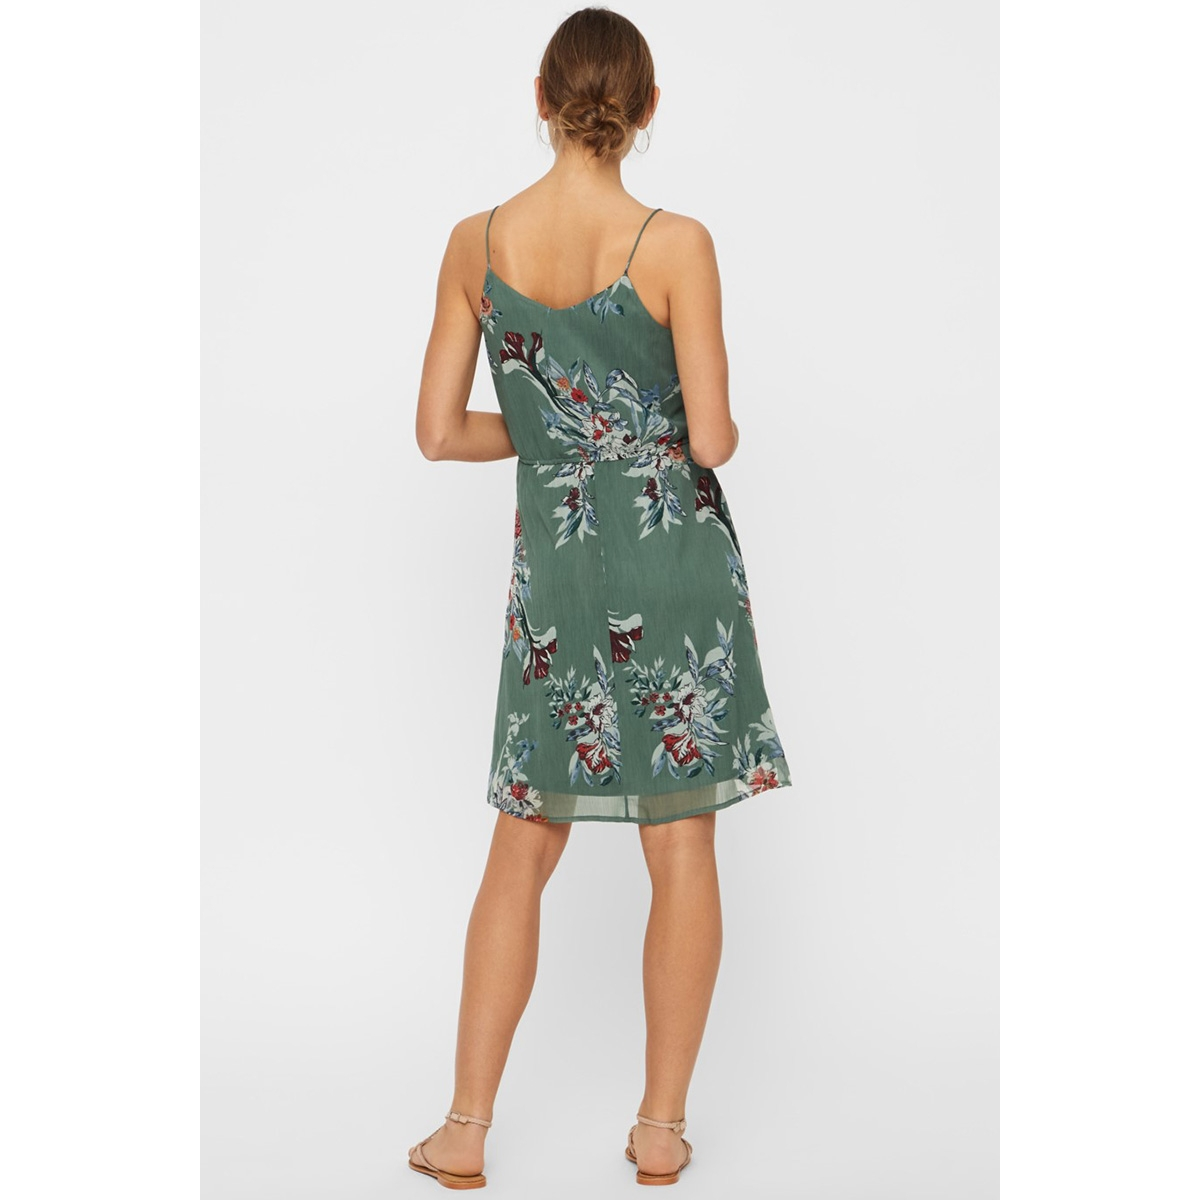 vmwonda singlet short dress exp 10166410 vero moda jurk laurel wreath/lea